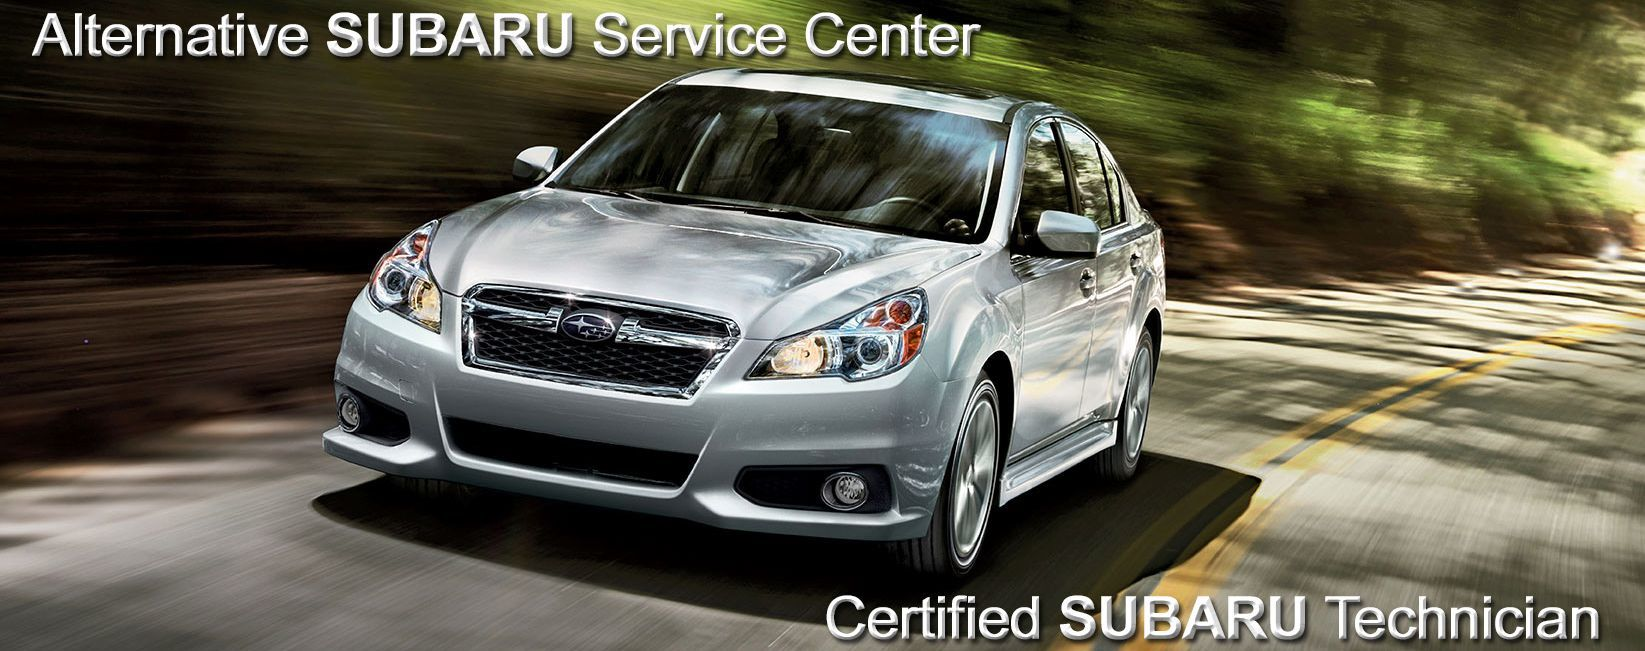 Subaru auto service repair greensboro nc at eurobahn for Mercedes benz of greensboro greensboro nc